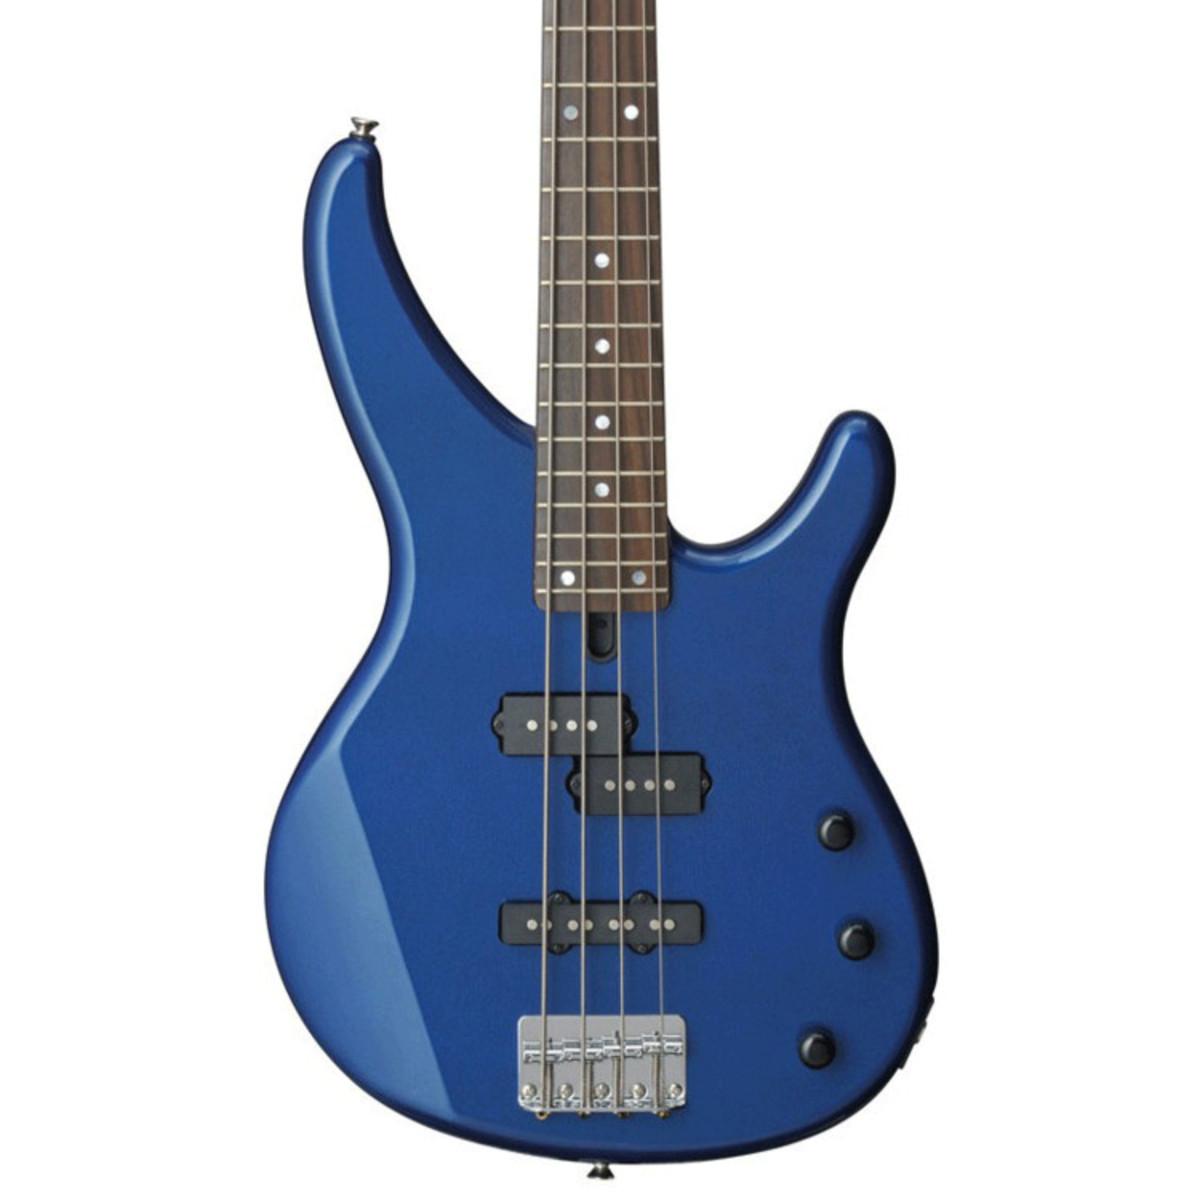 Yamaha trbx174 bass guitar dark metallic blue at gear4music for Yamaha bass guitars